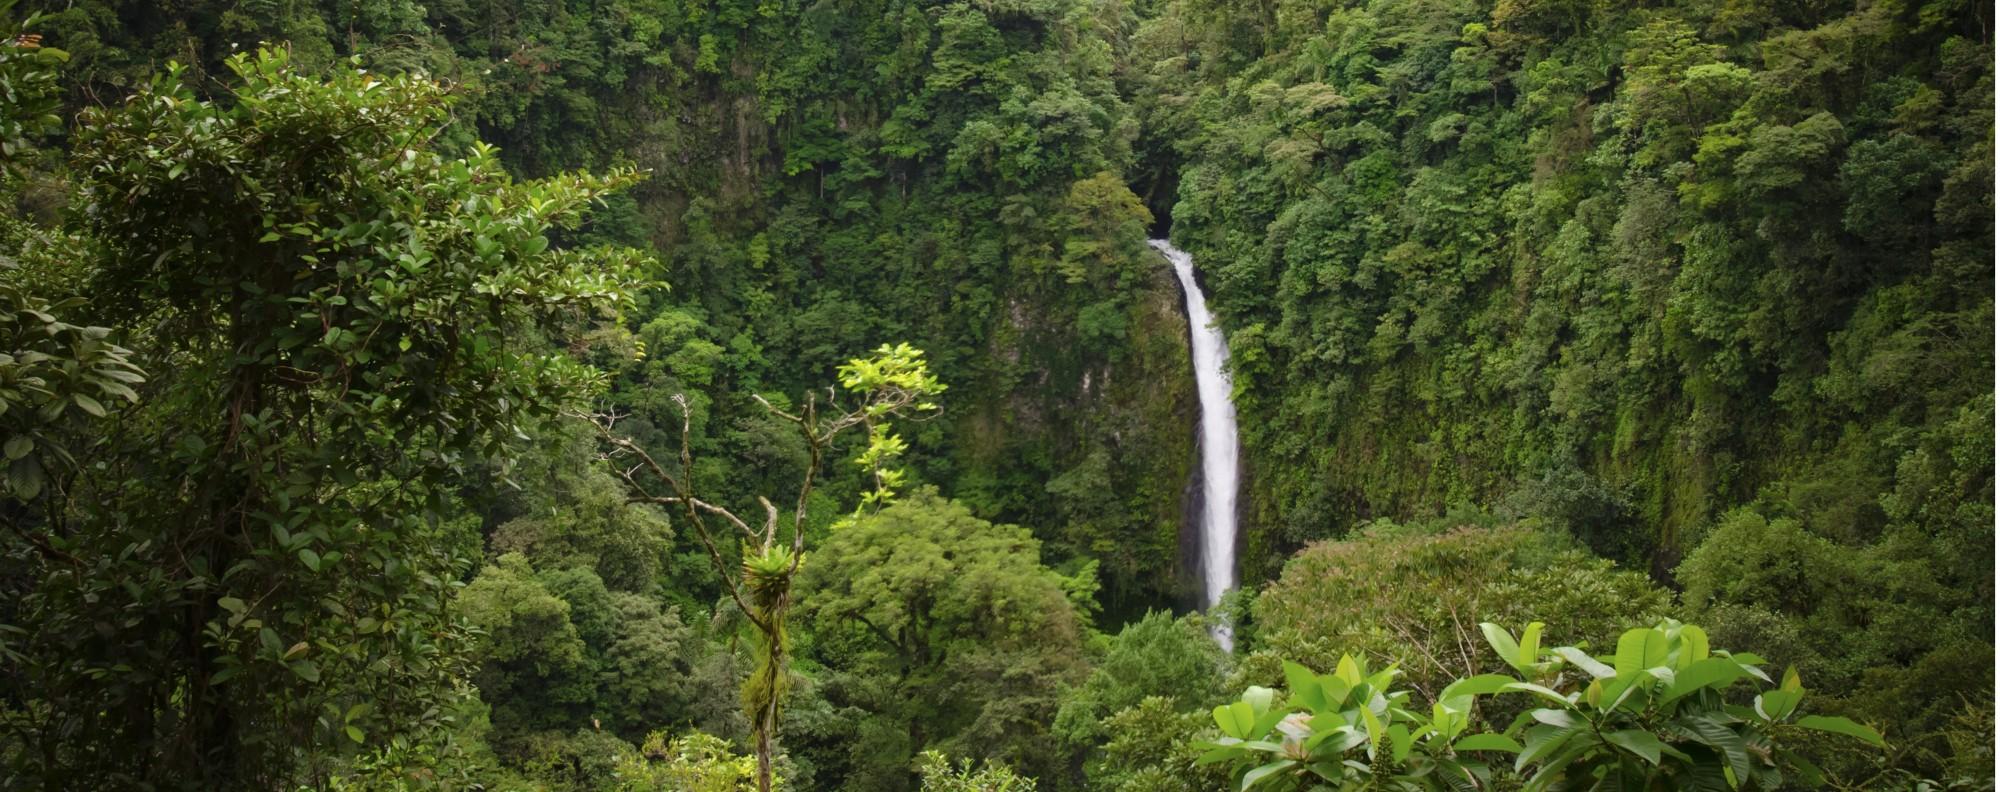 La Fortuna Waterfall, in Alajuela, Costa Rica. Picture: Shutterstock